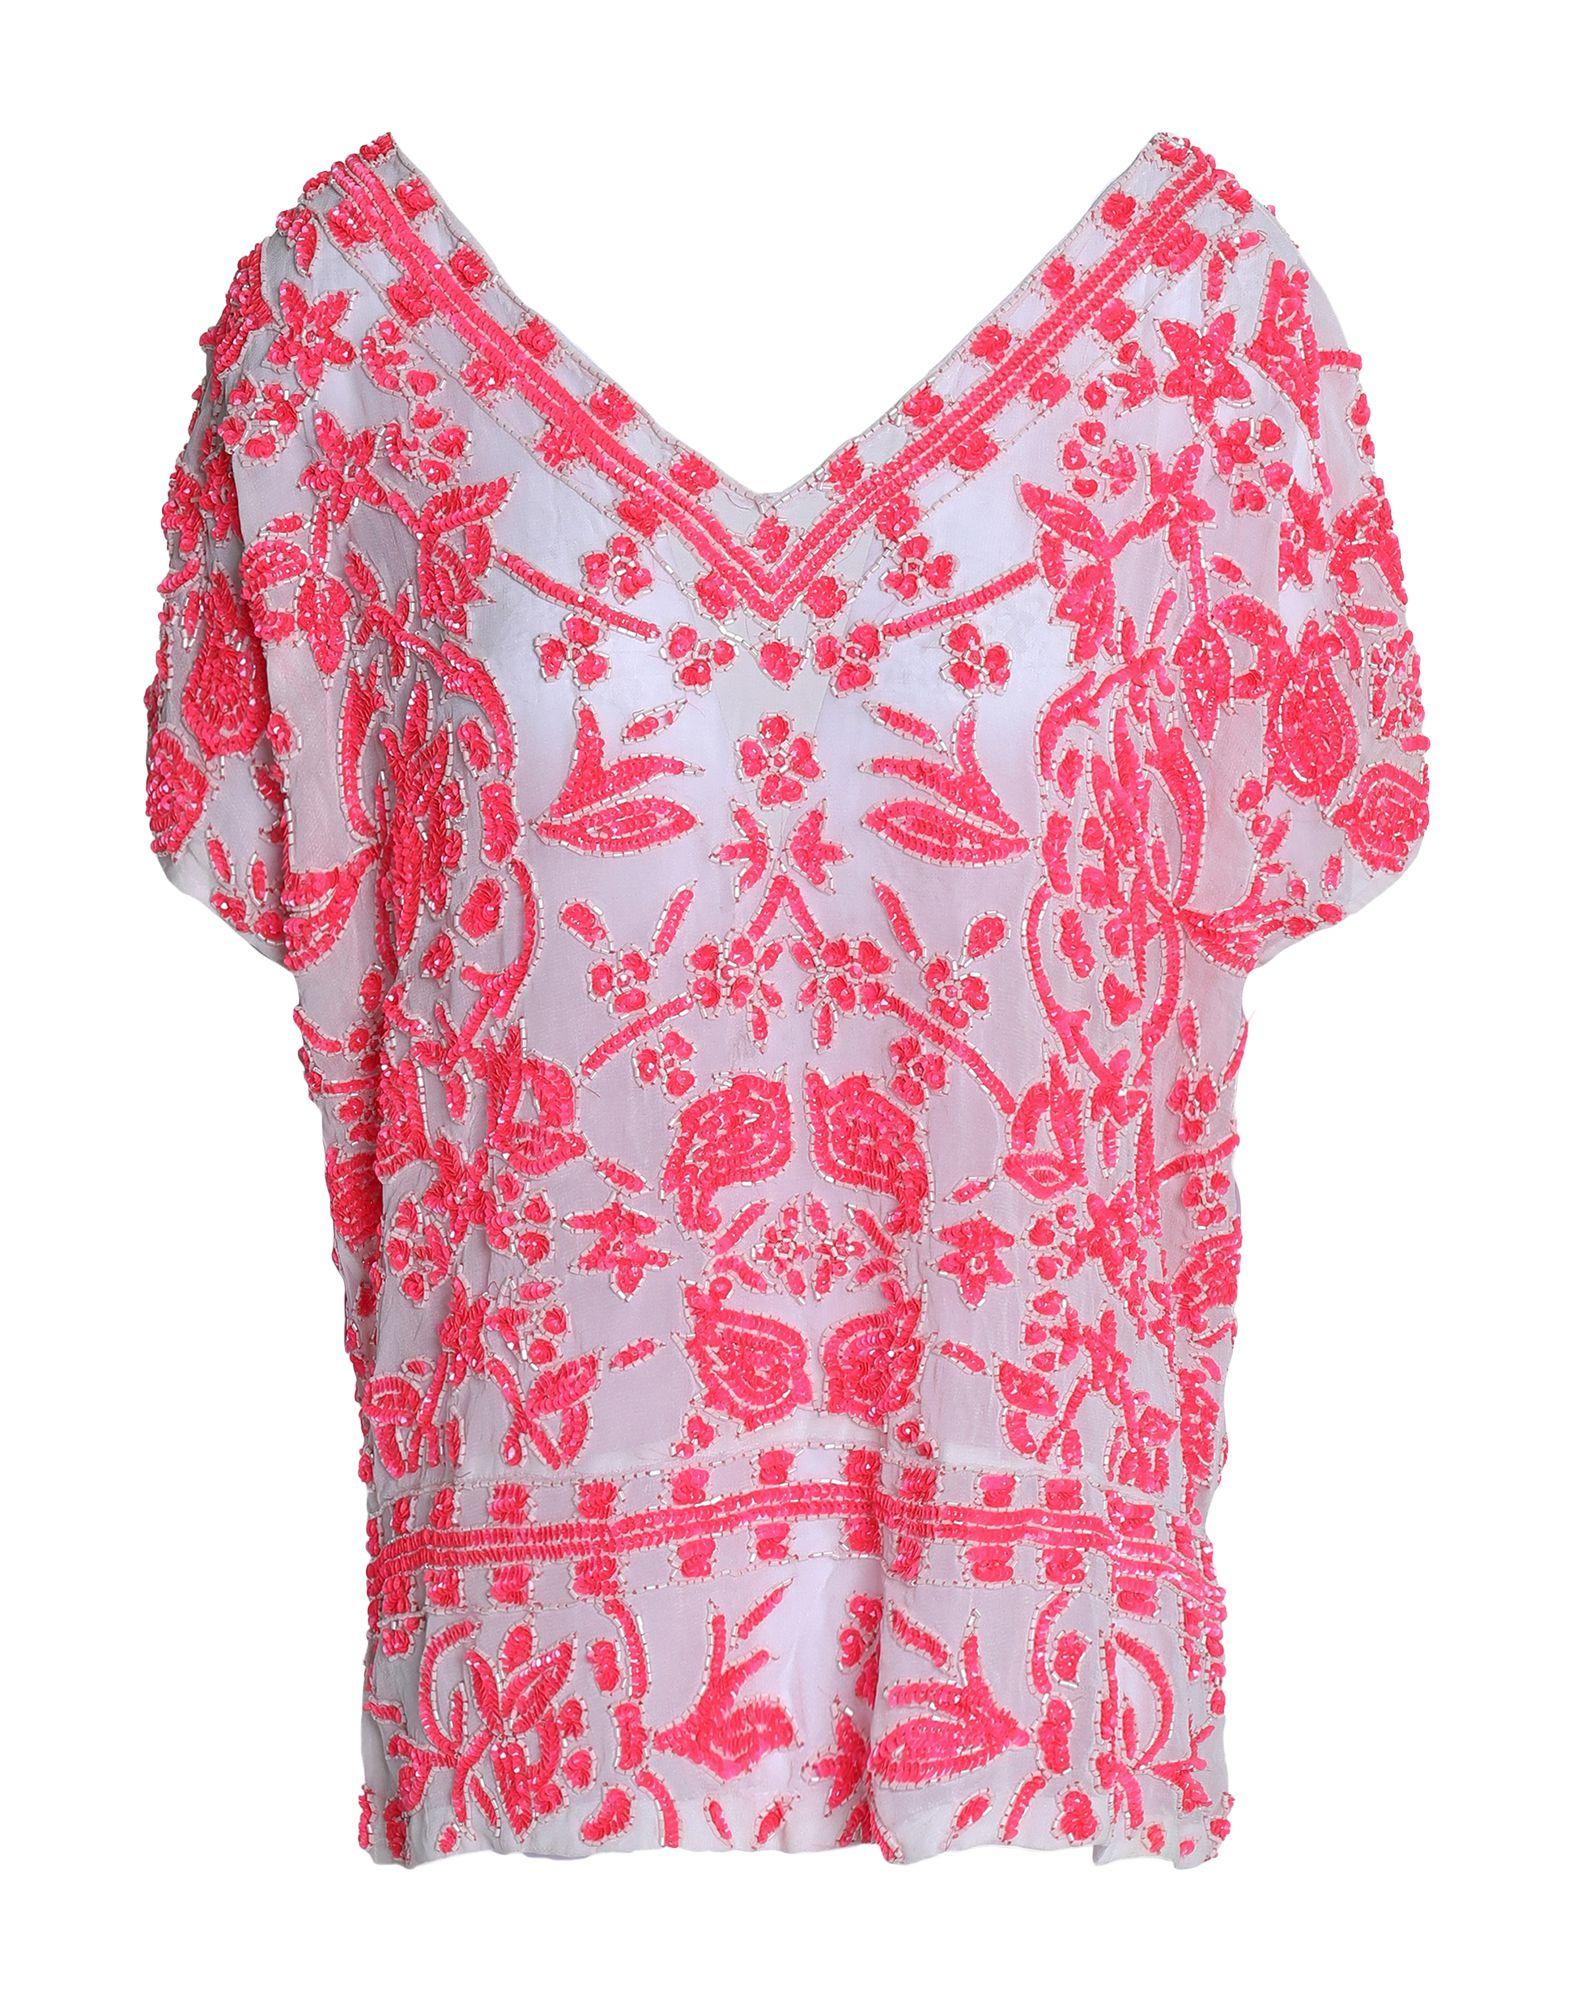 ANTIK BATIK Блузка batik batik брюки кира 1 серый